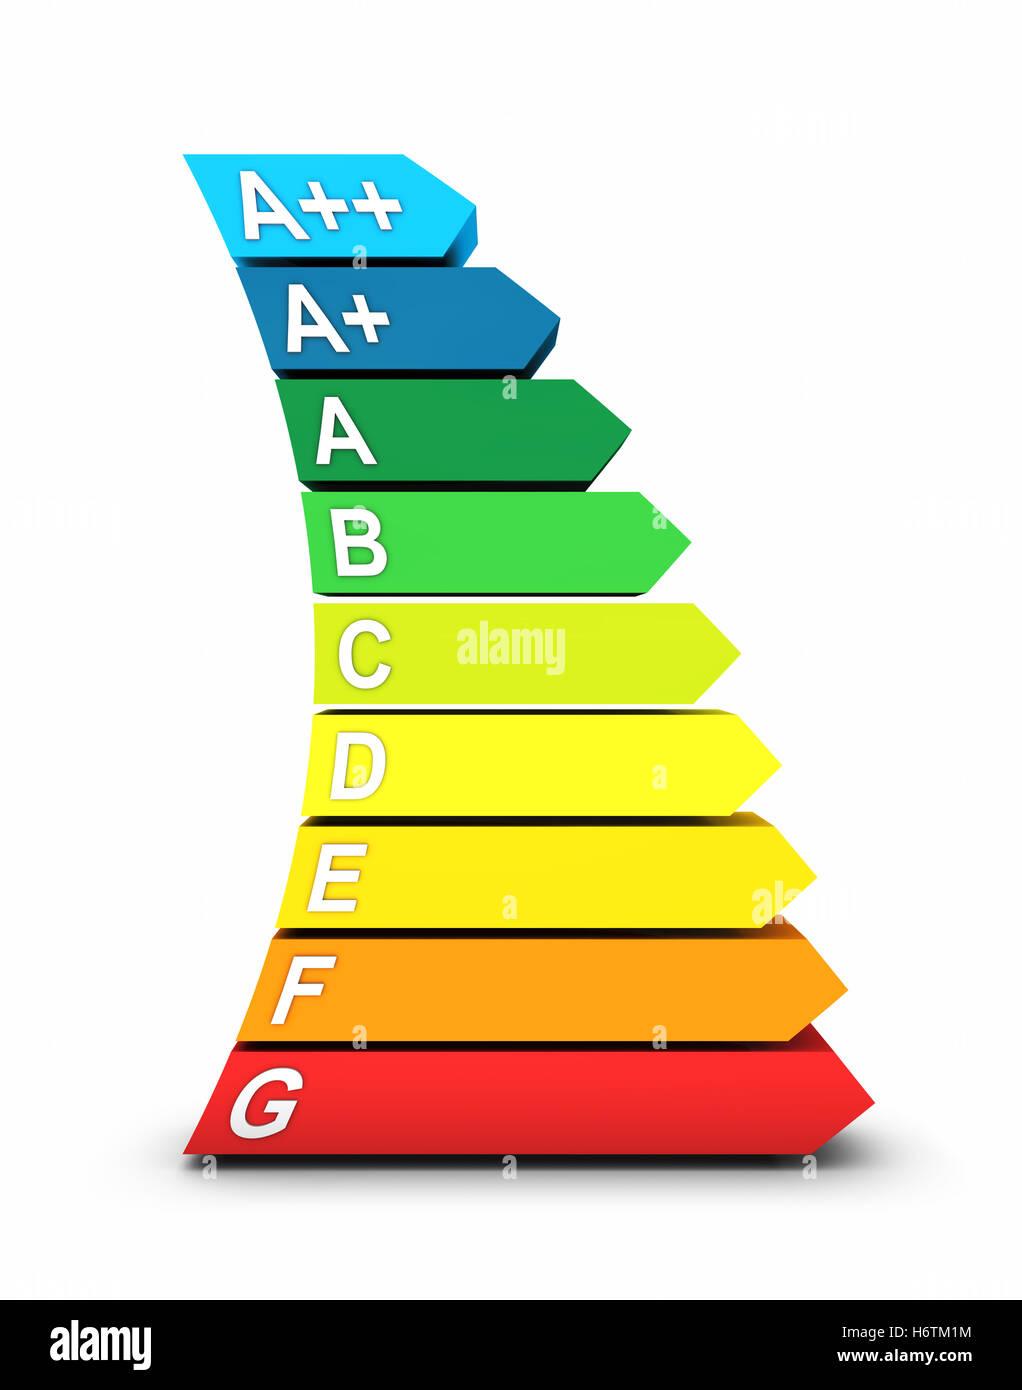 Energy efficiency classes stock photos energy efficiency classes bent 3d energy efficiency classes stock image ccuart Choice Image